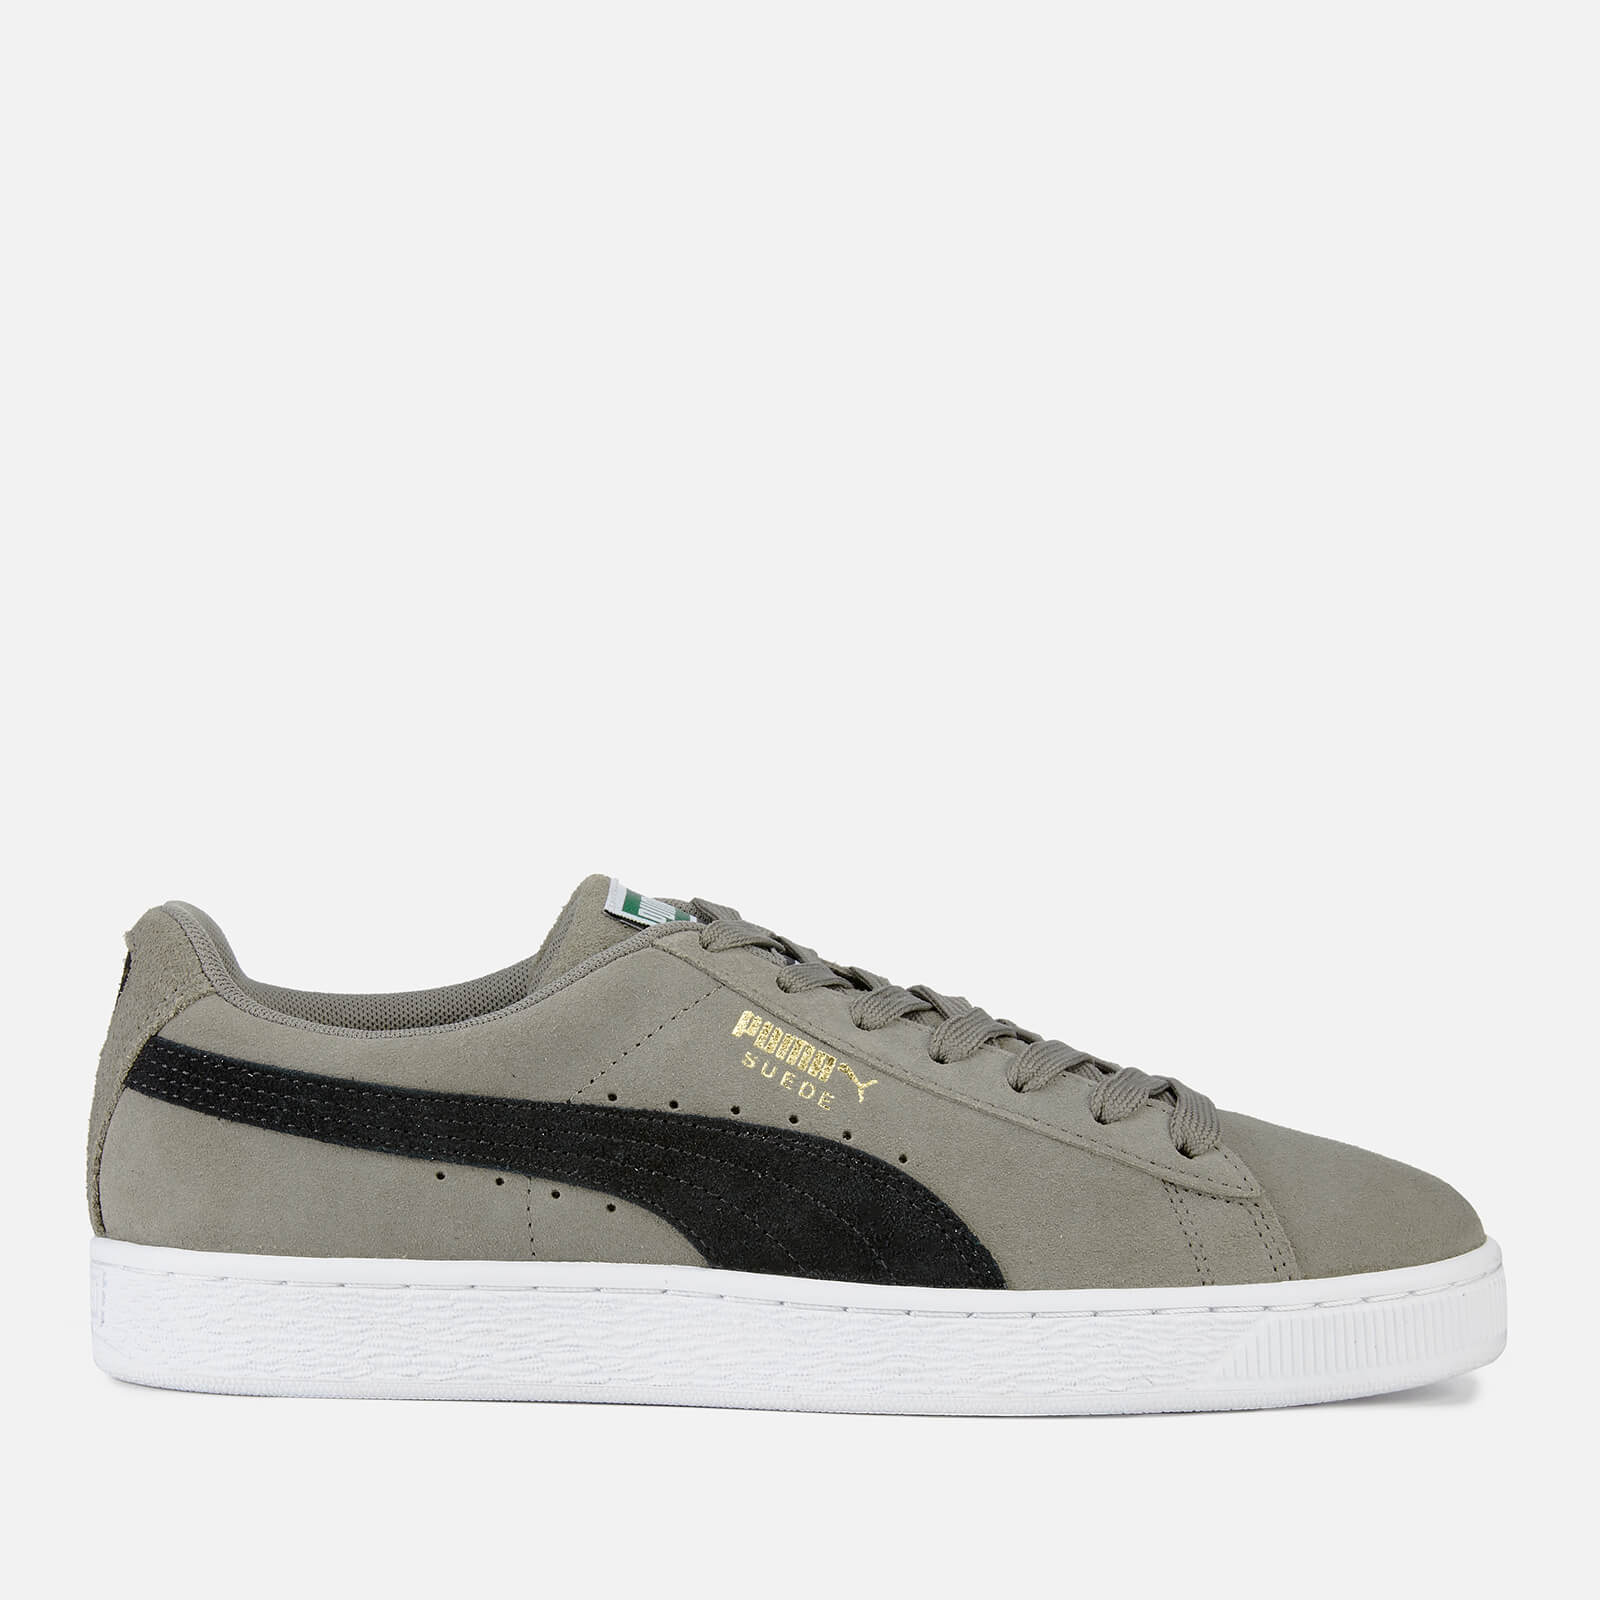 online store cdbd7 1143a Puma Men's Suede Classic Trainers - Charcoal Grey/Puma Black